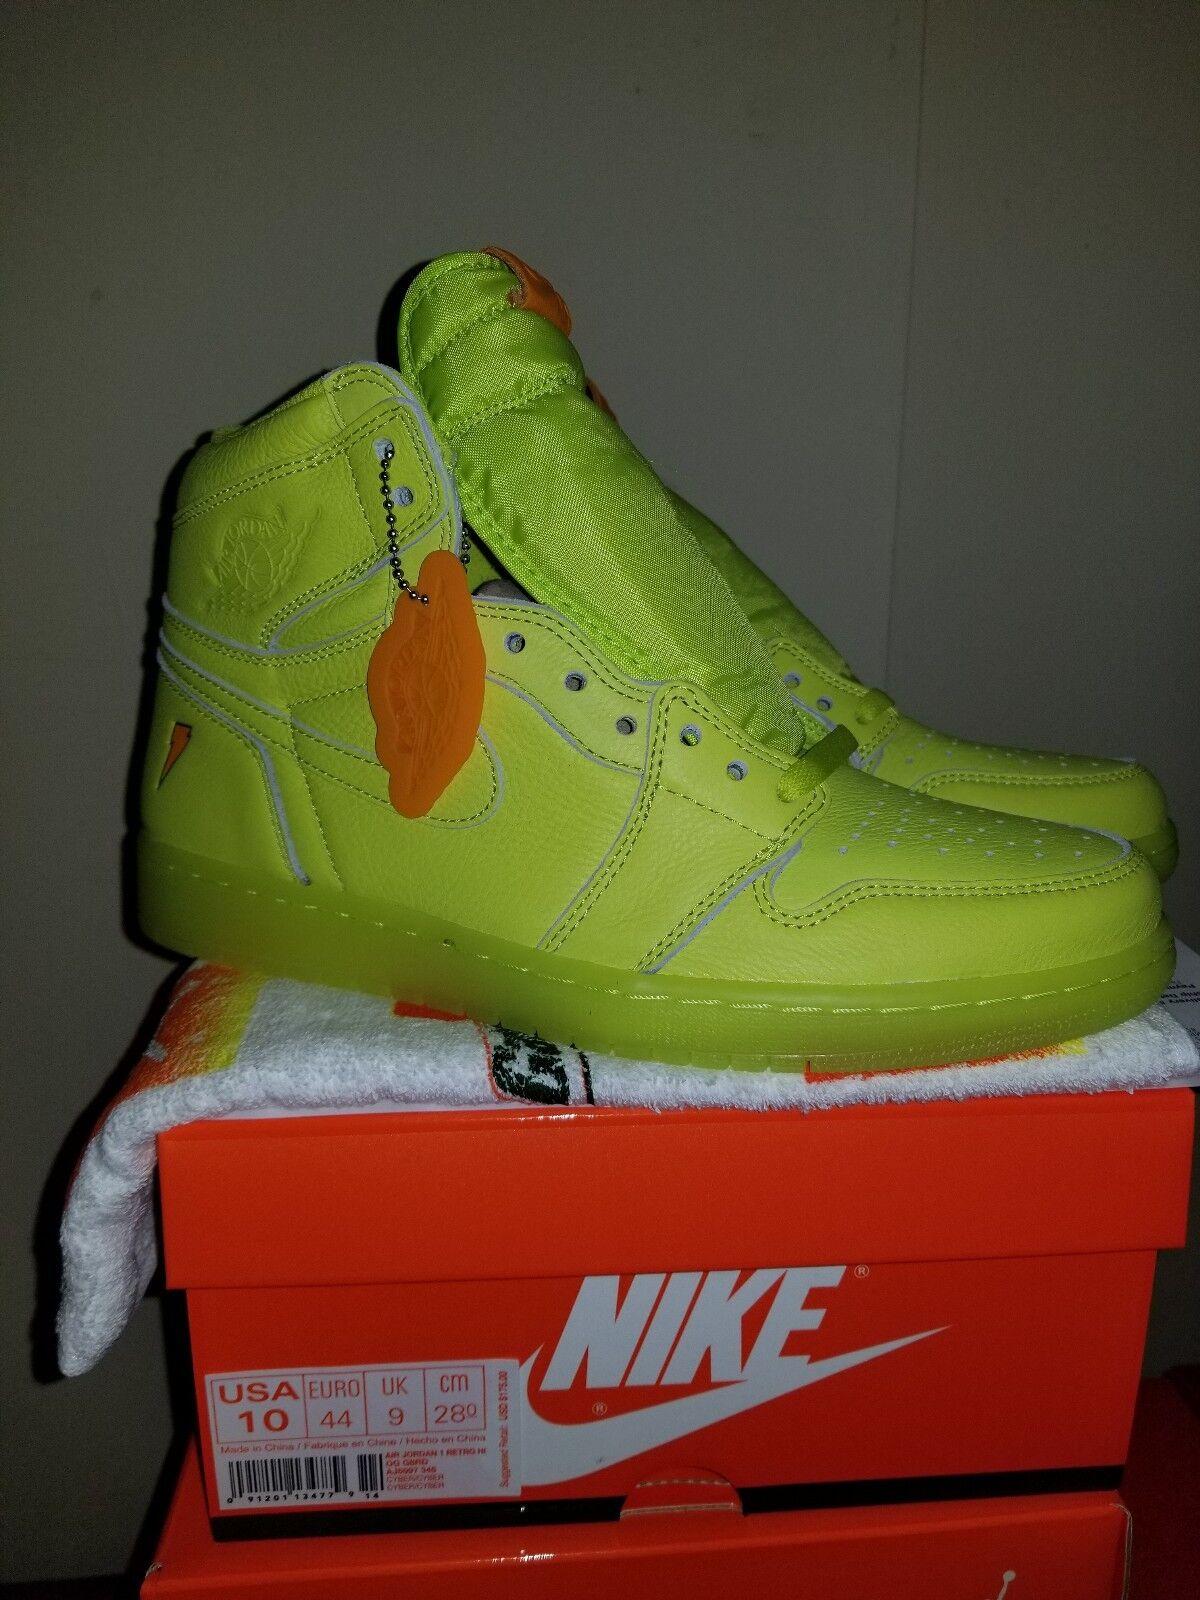 Air Jordan 1 Retro High OG Gatorade Cyber Lemon Lime-size 10